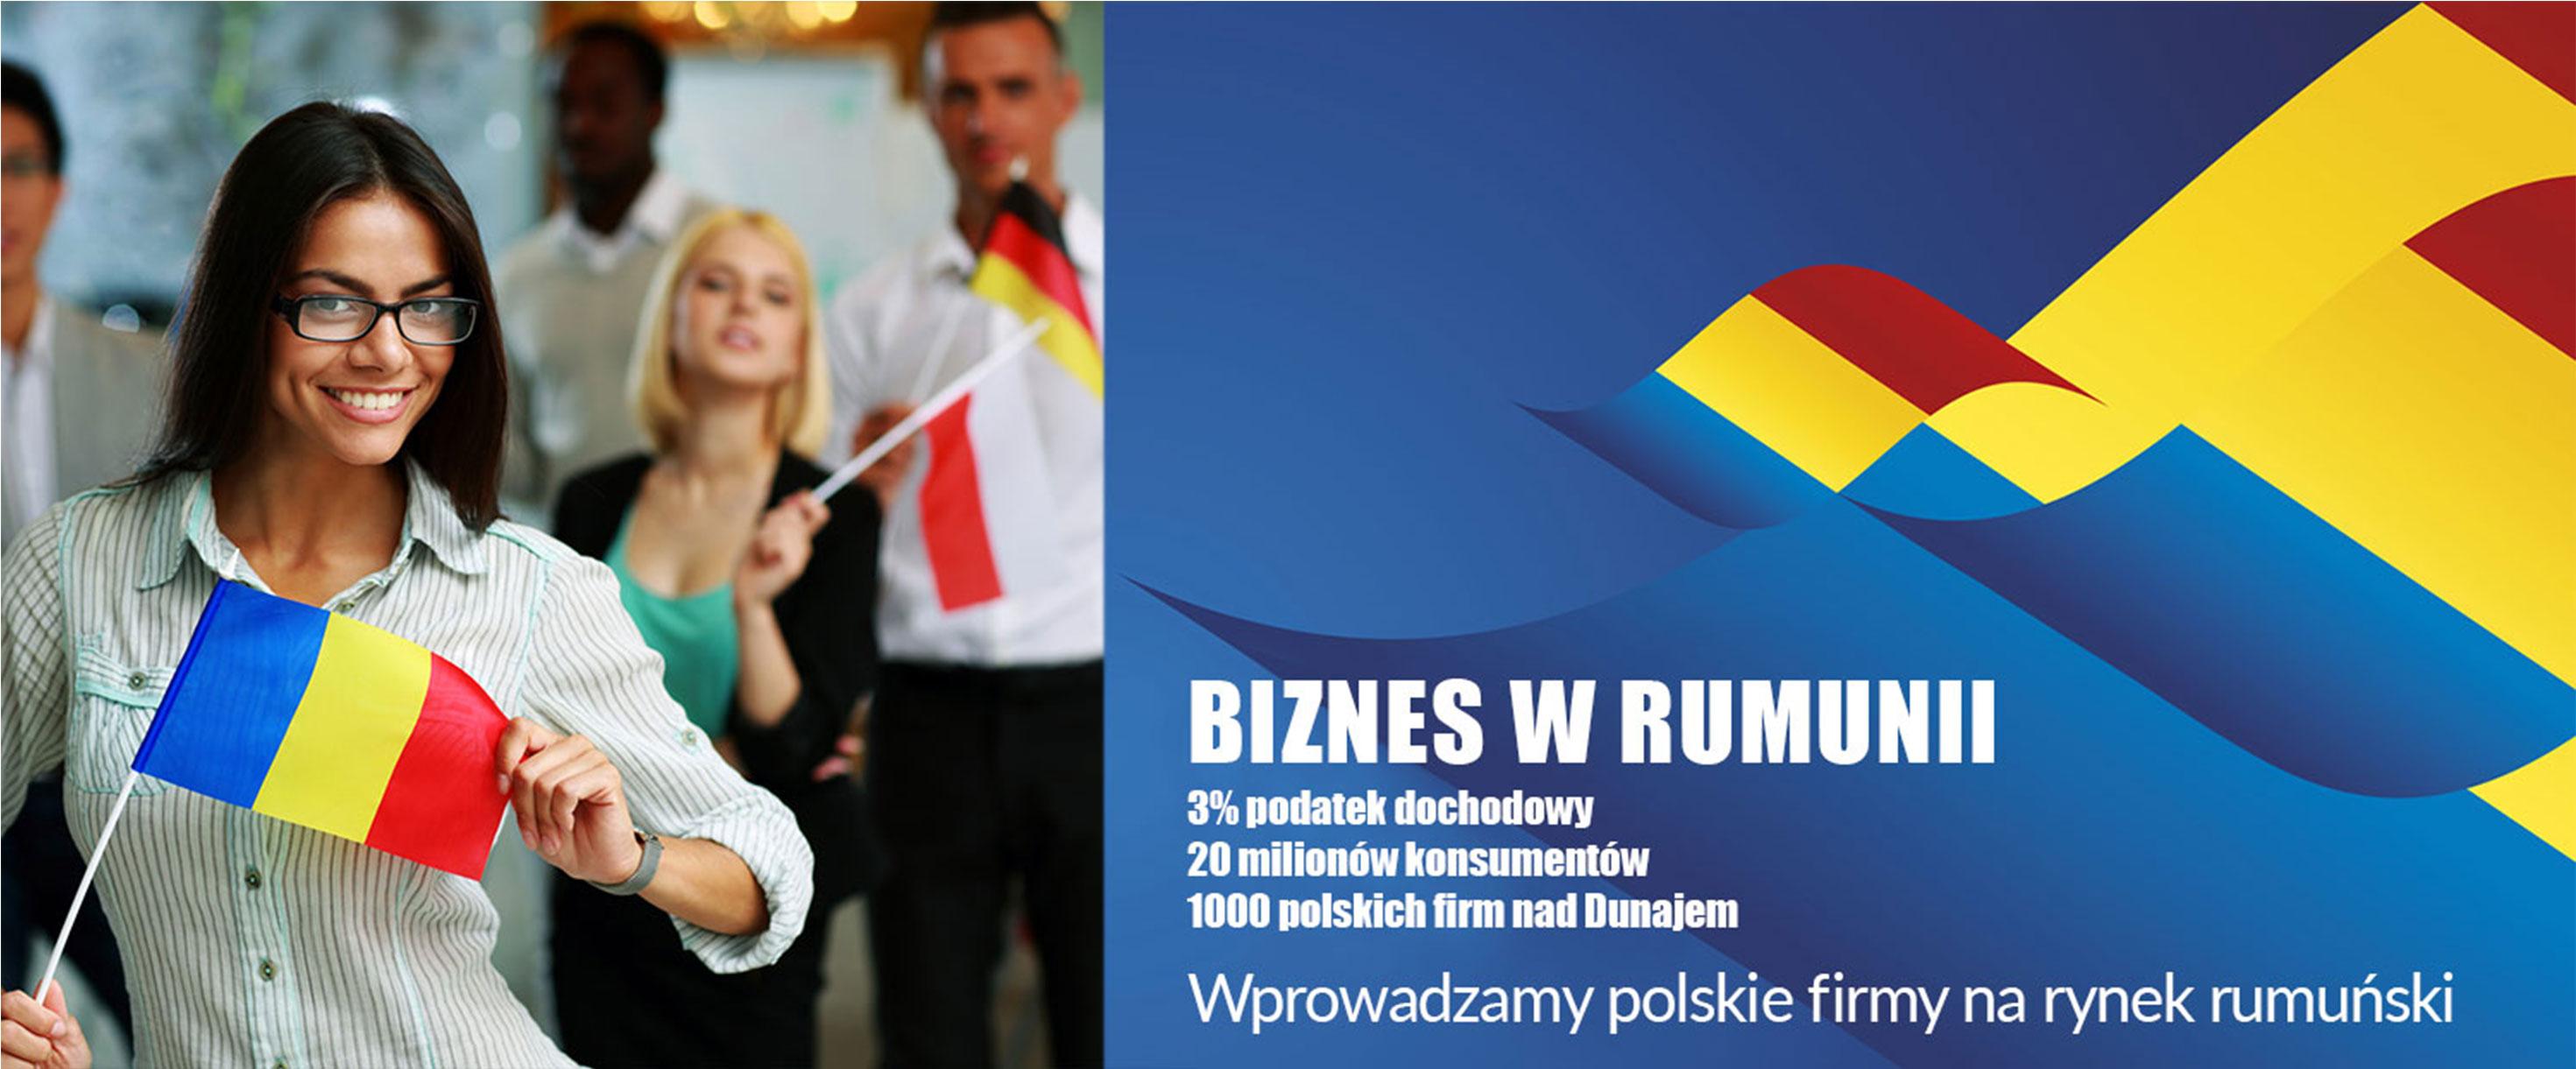 Biznes w Rumunii